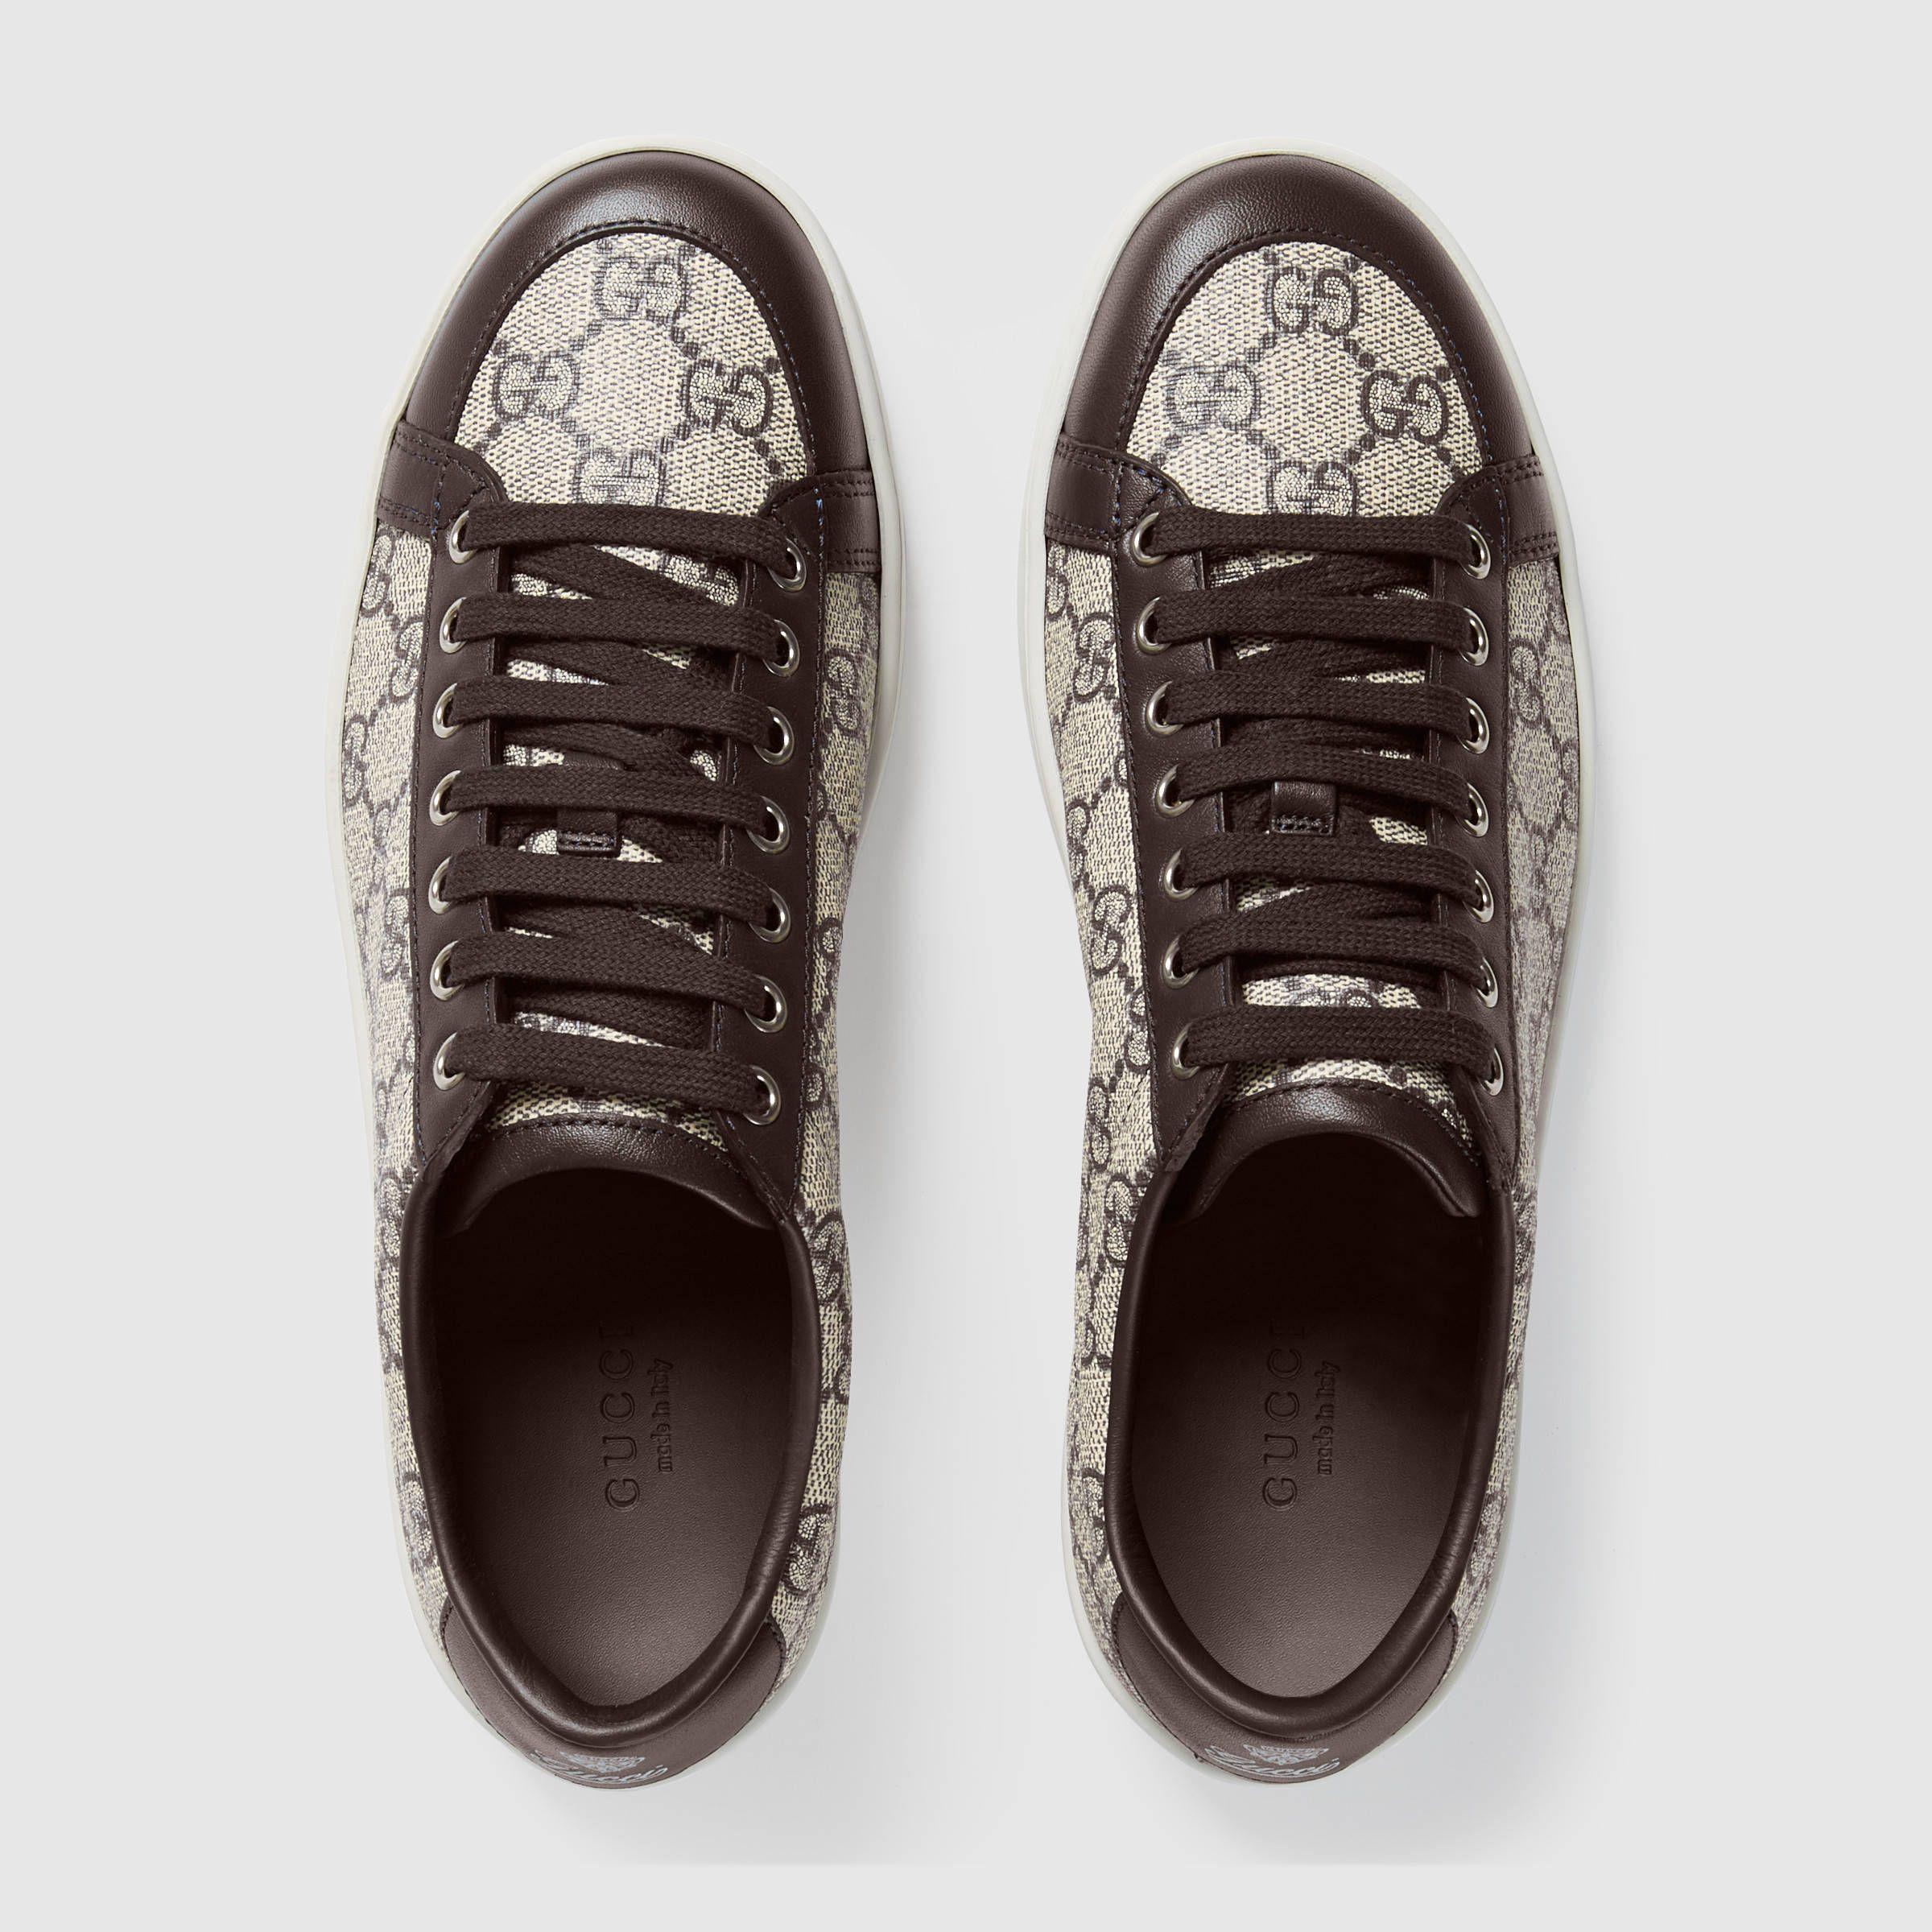 Gucci Brooklyn GG Supreme sneaker